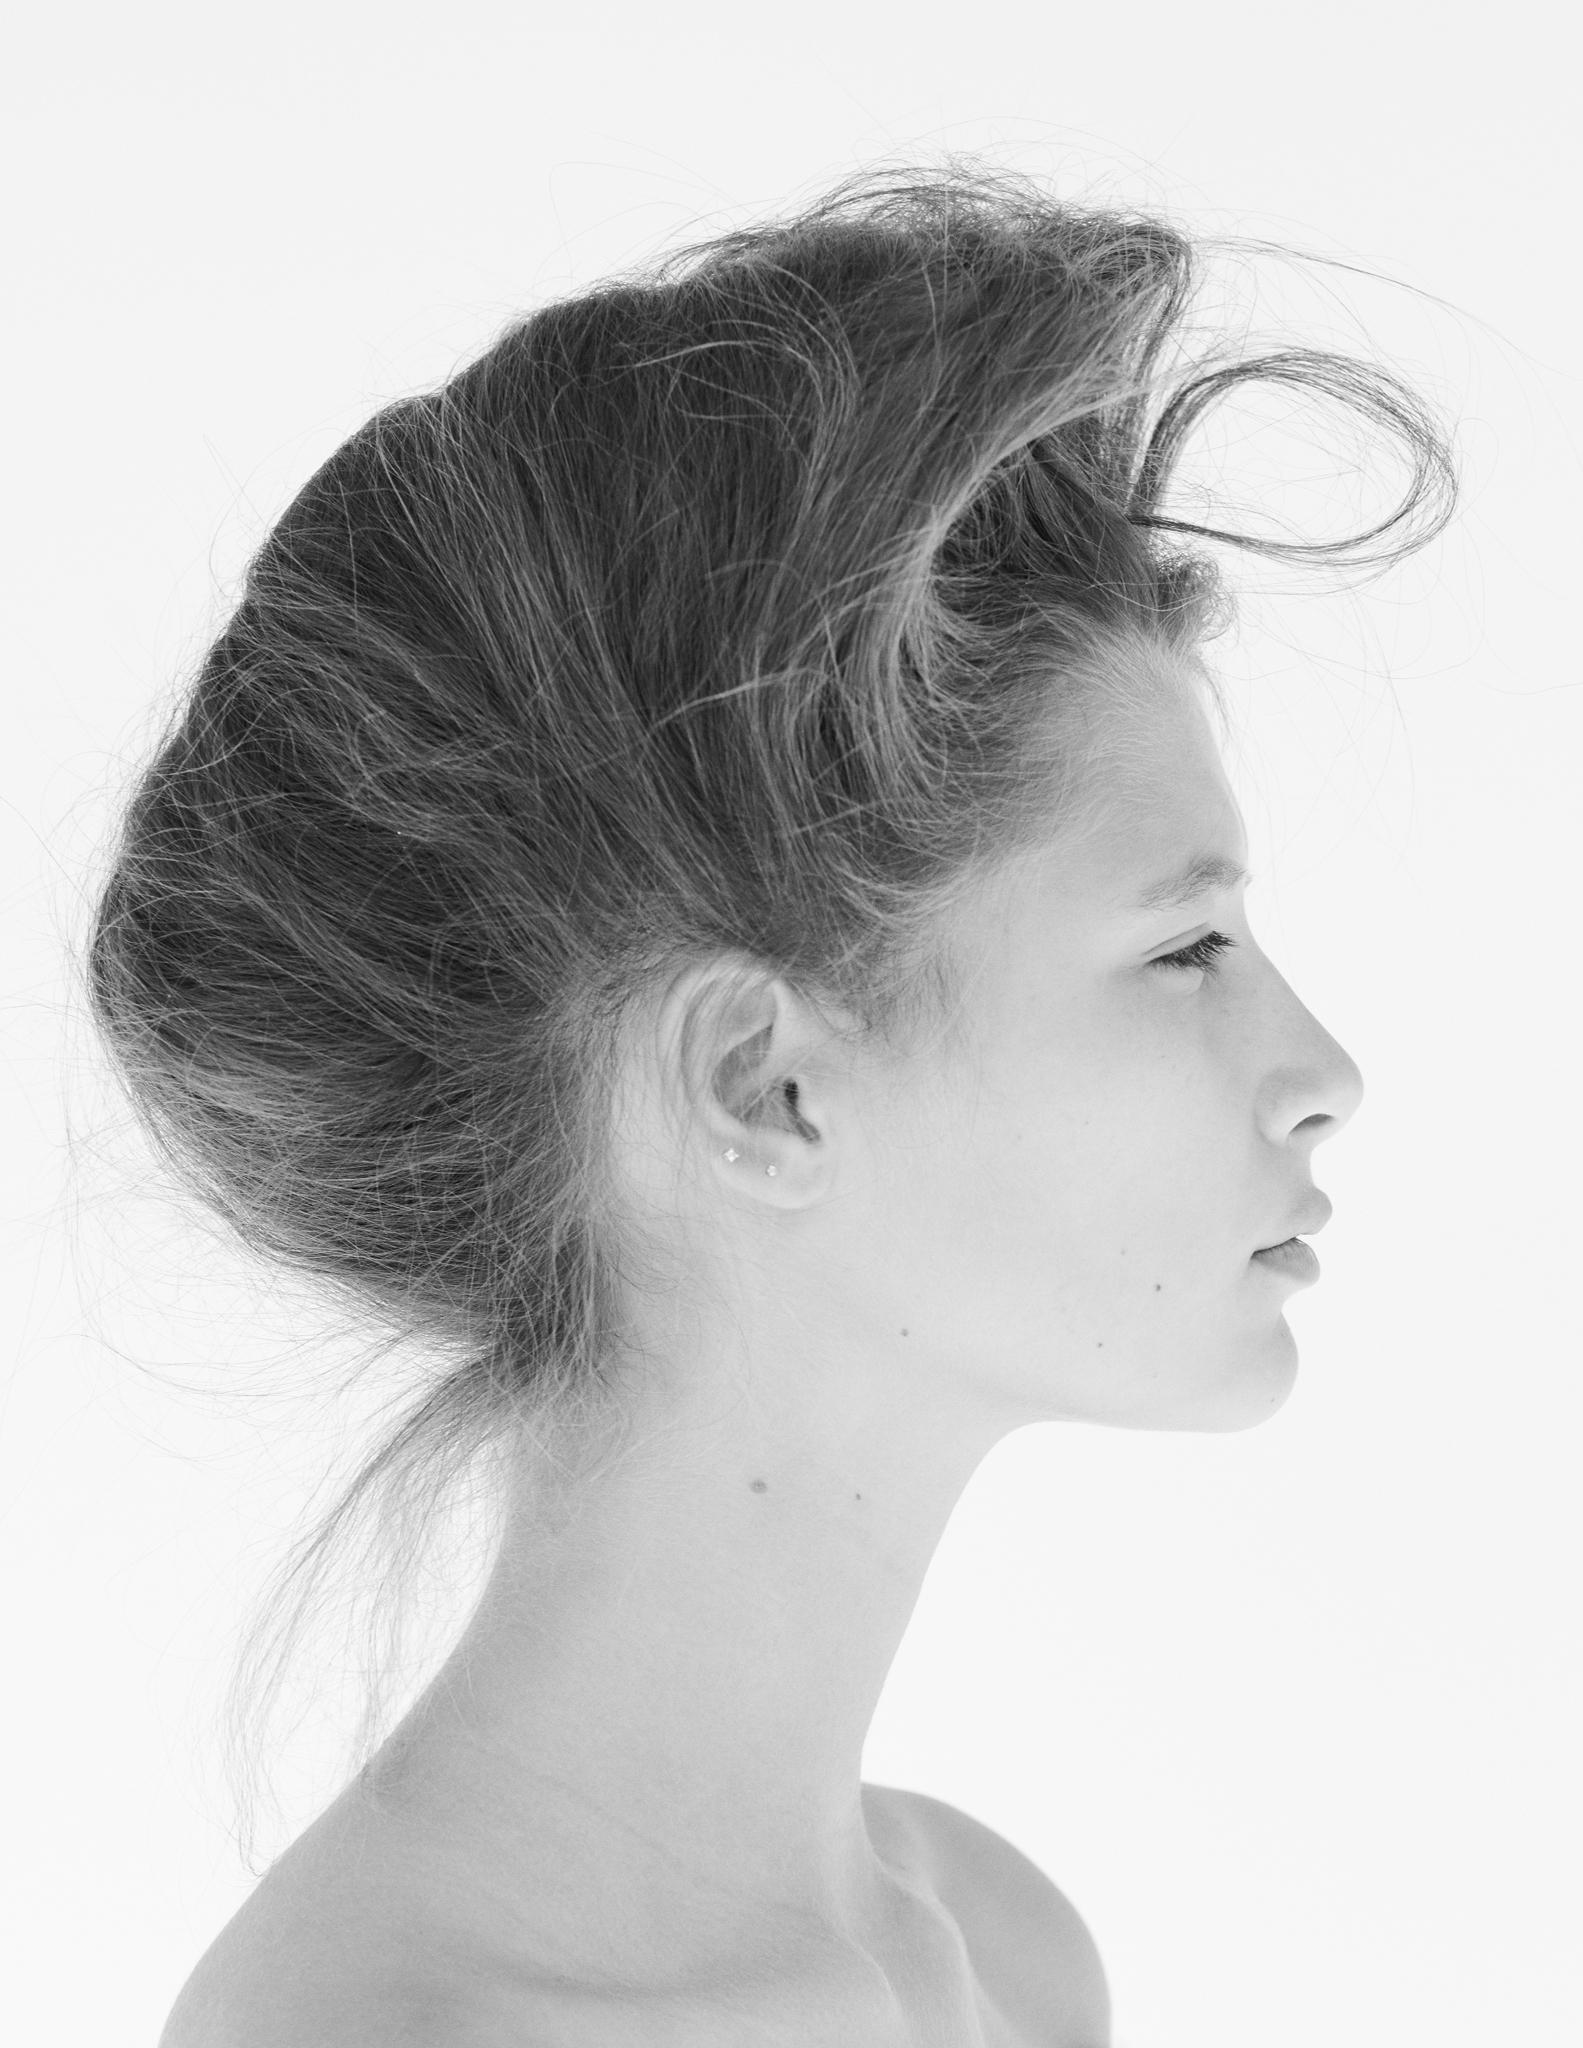 180506 HAIR TEST10069.jpg